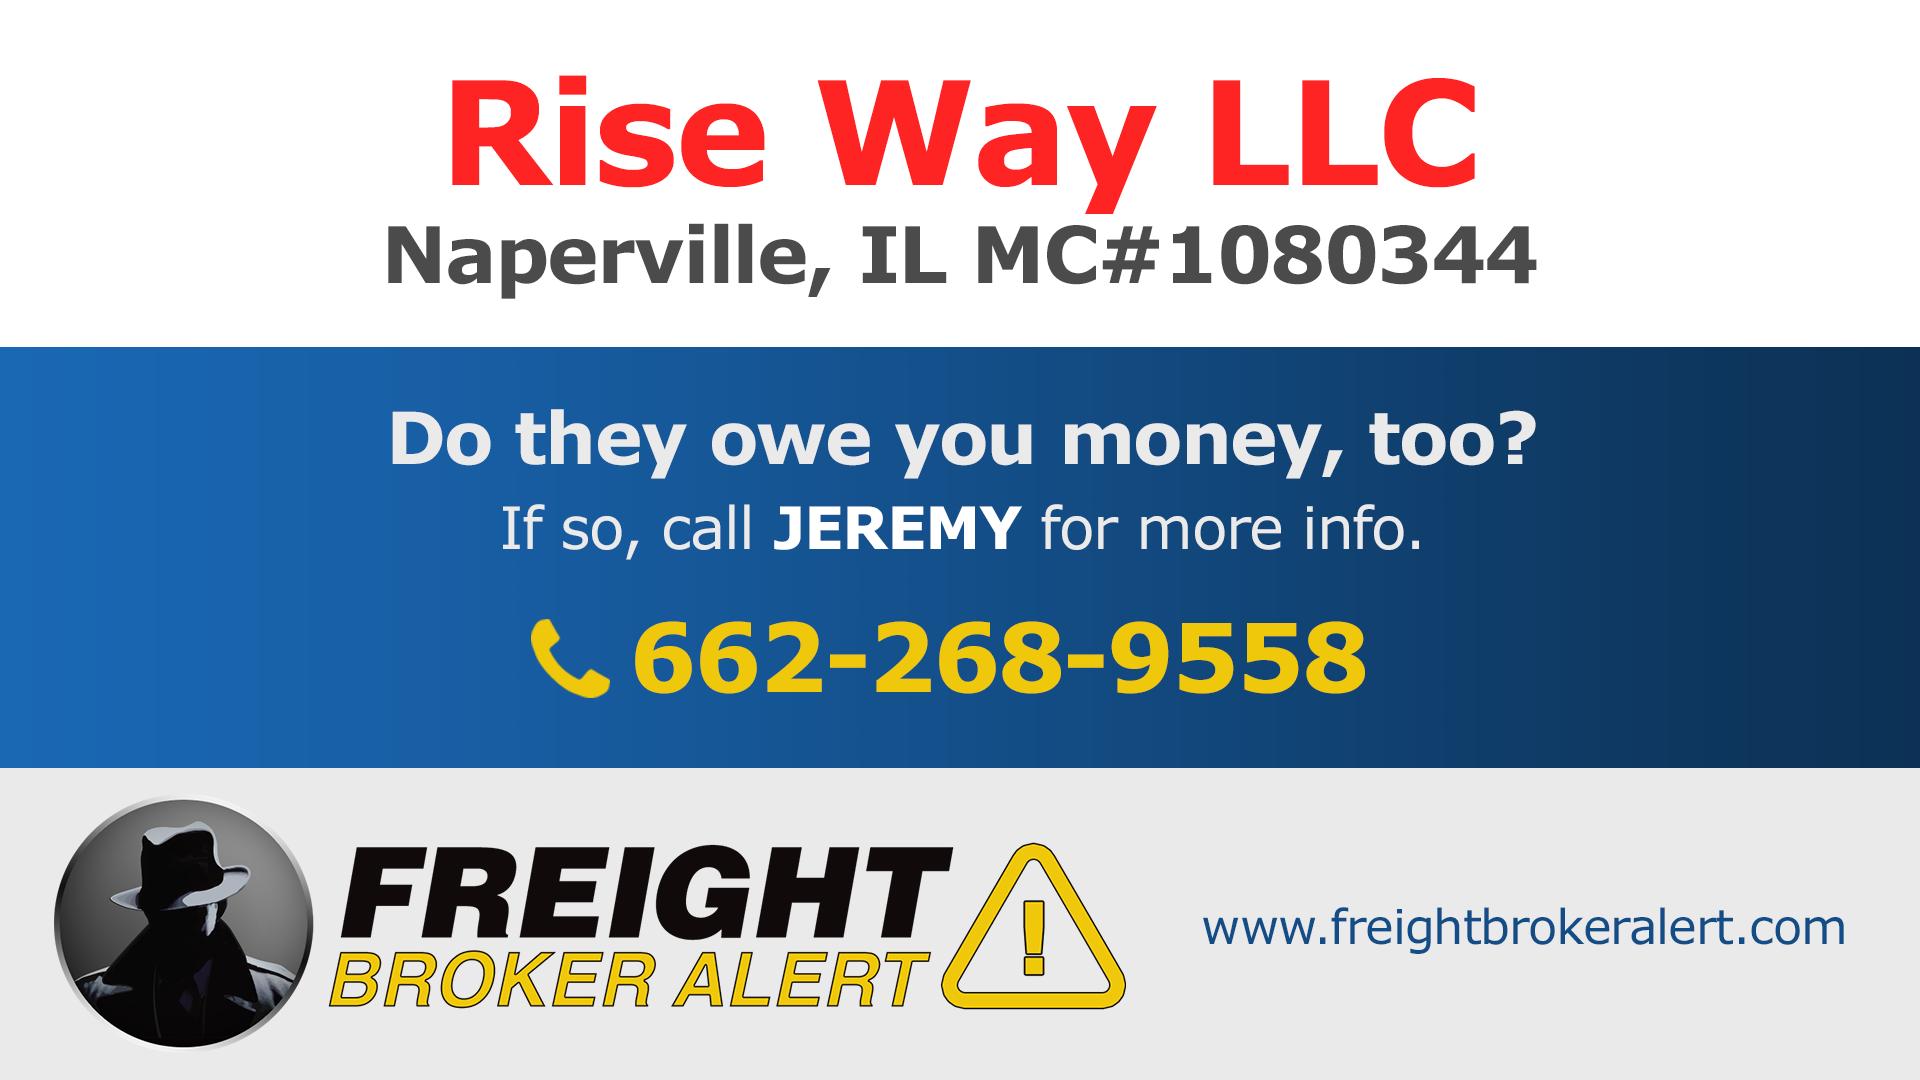 Rise Way LLC Illinois